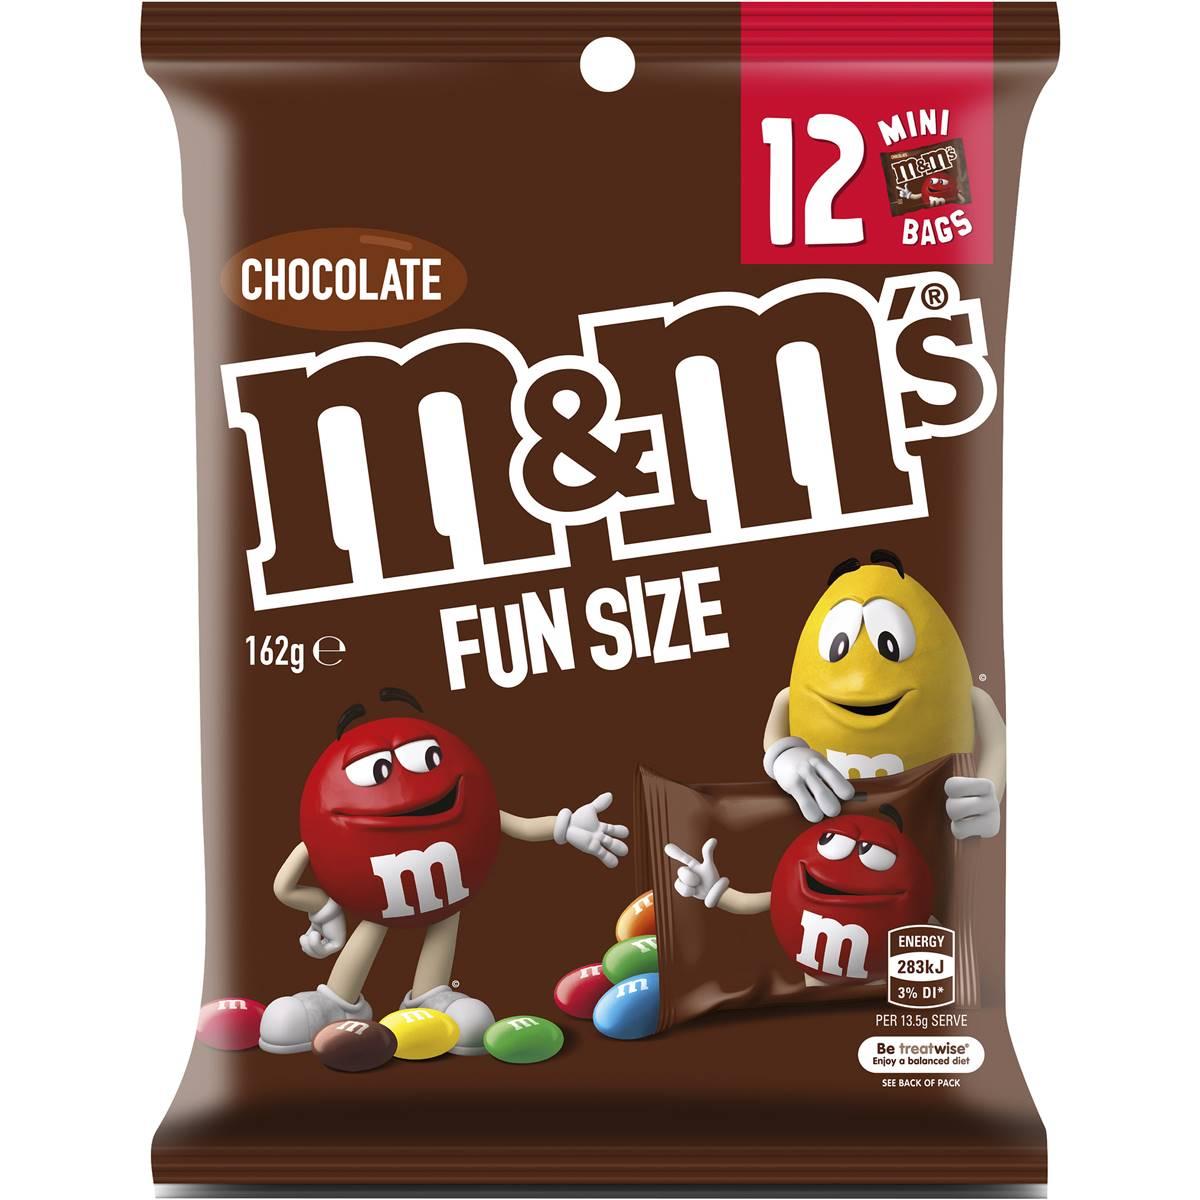 M&m's Chocolate Medium Party Share Bag 12 Piece